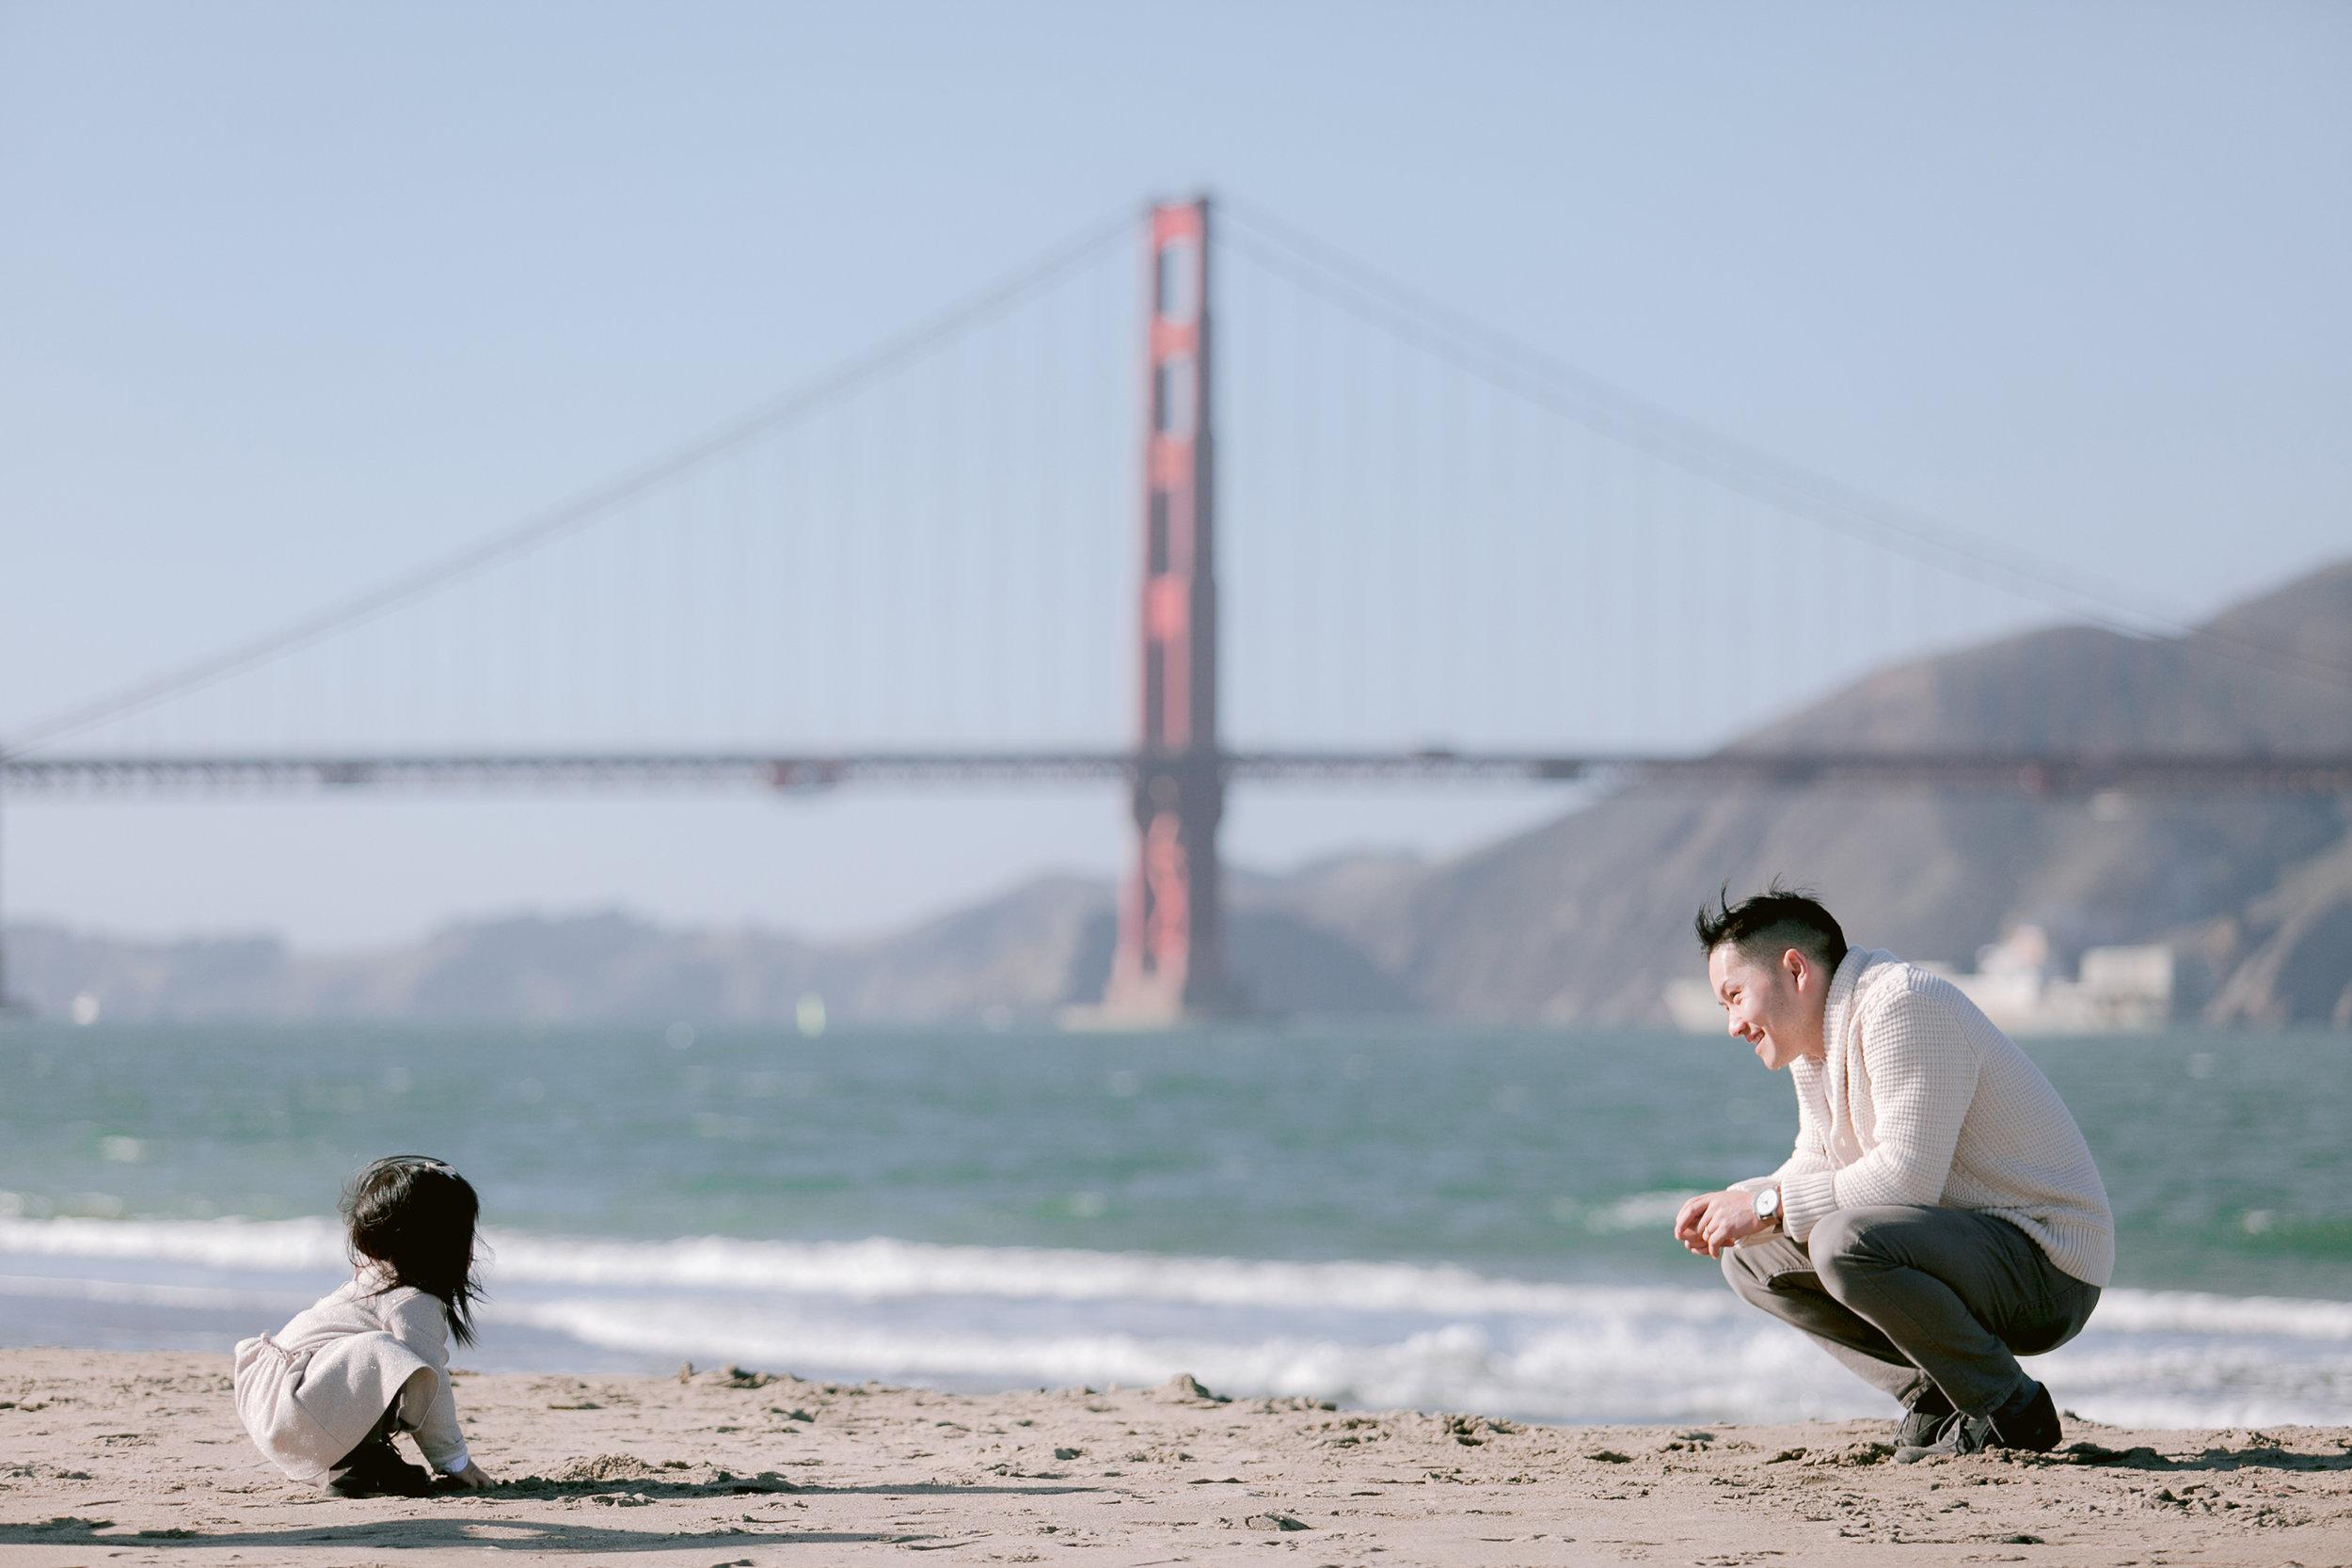 San_Francisco_Children_and_Family_Portrait_011.jpg